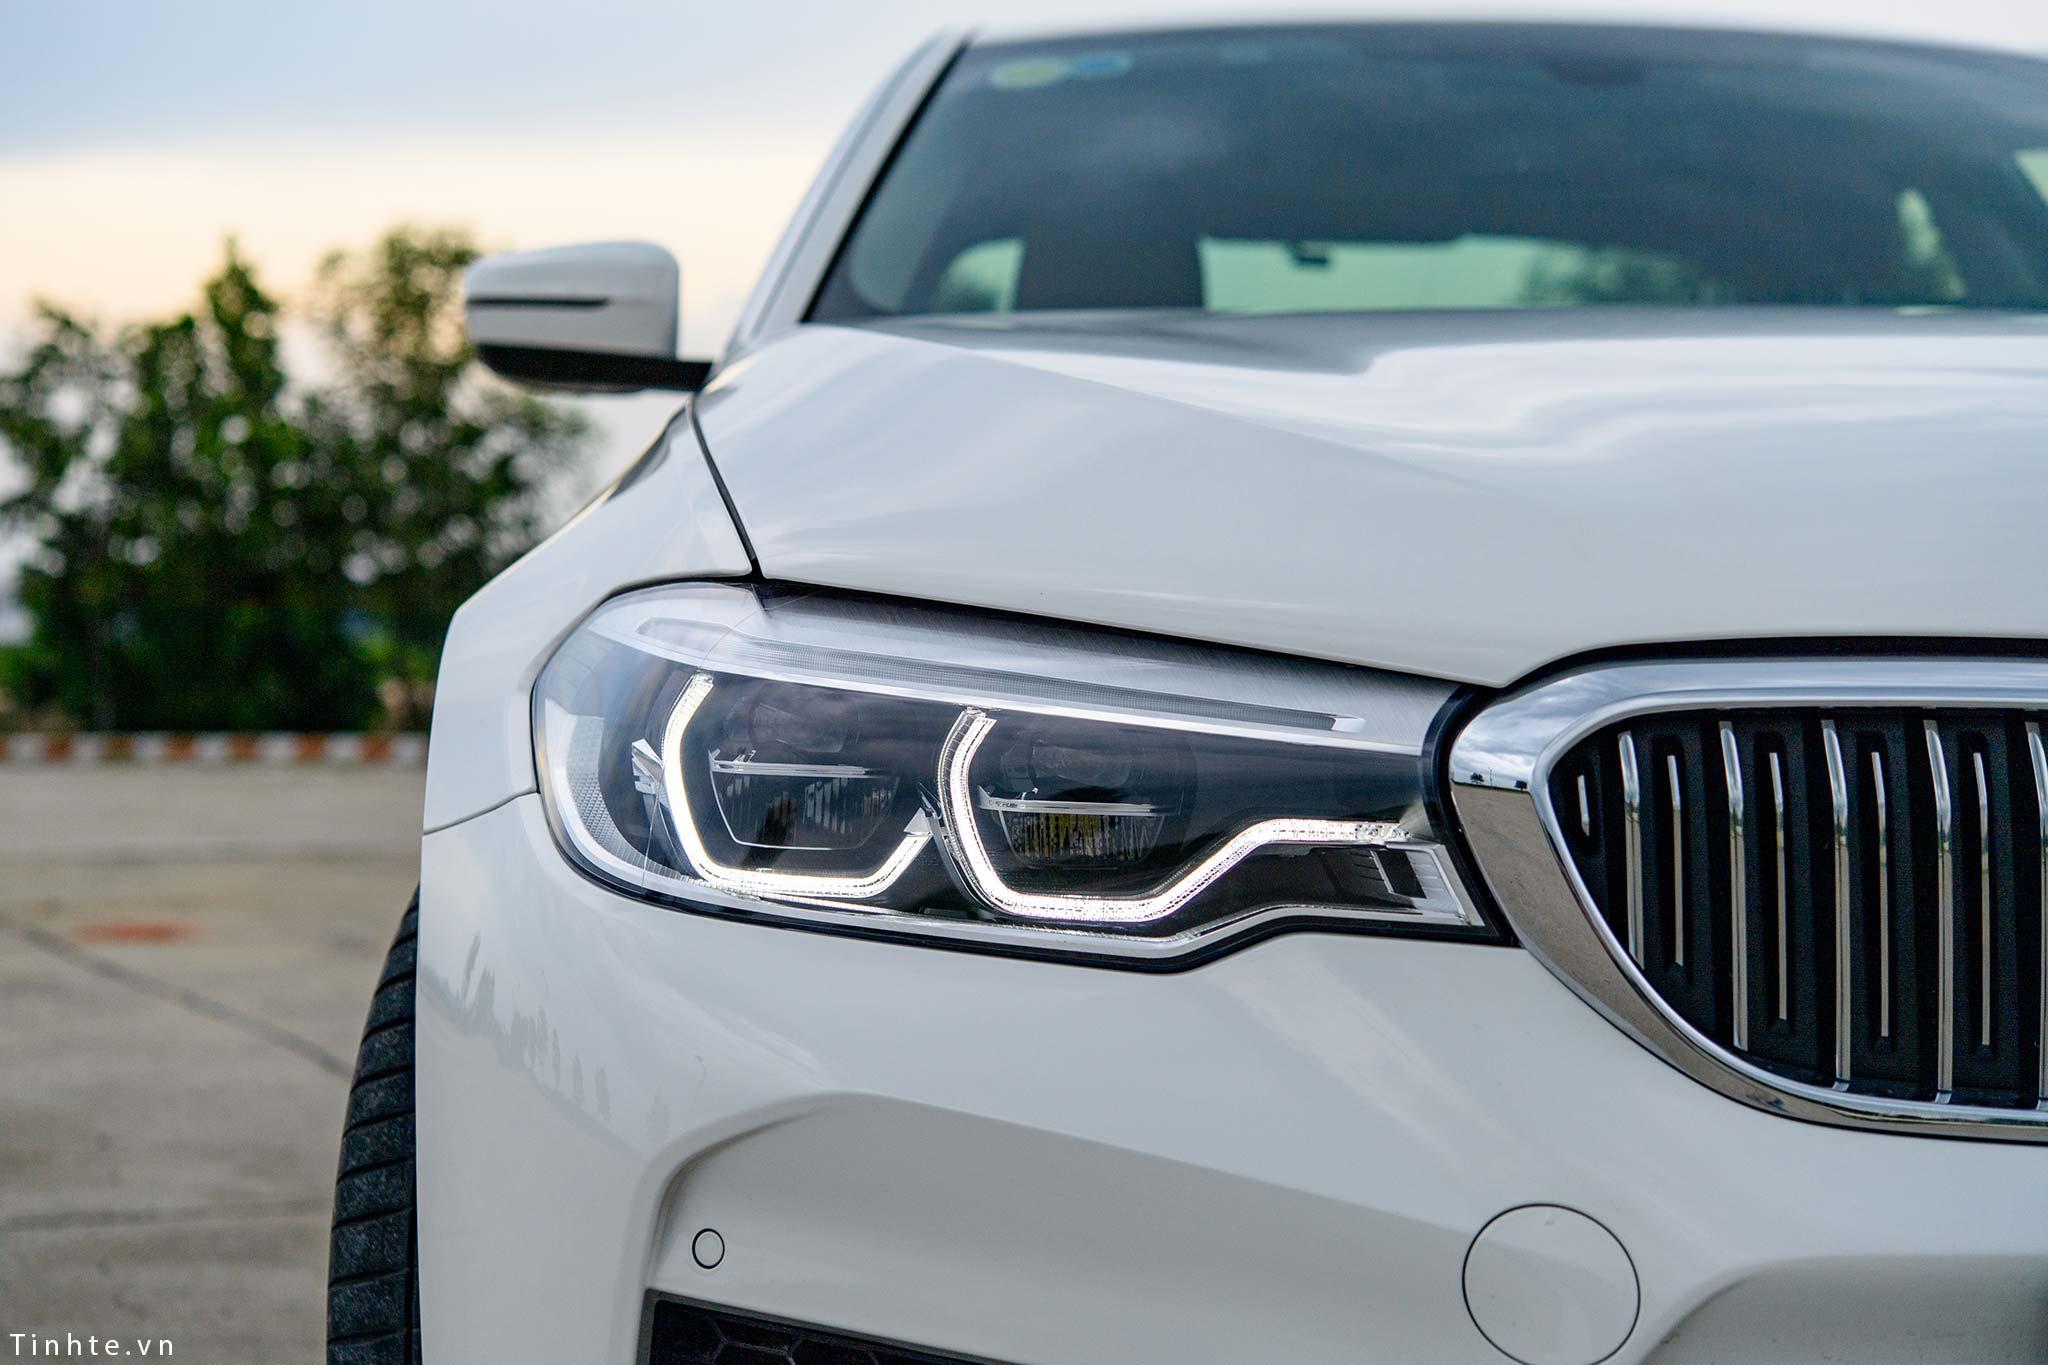 BMW_530i_G30_tinhte_4.jpg